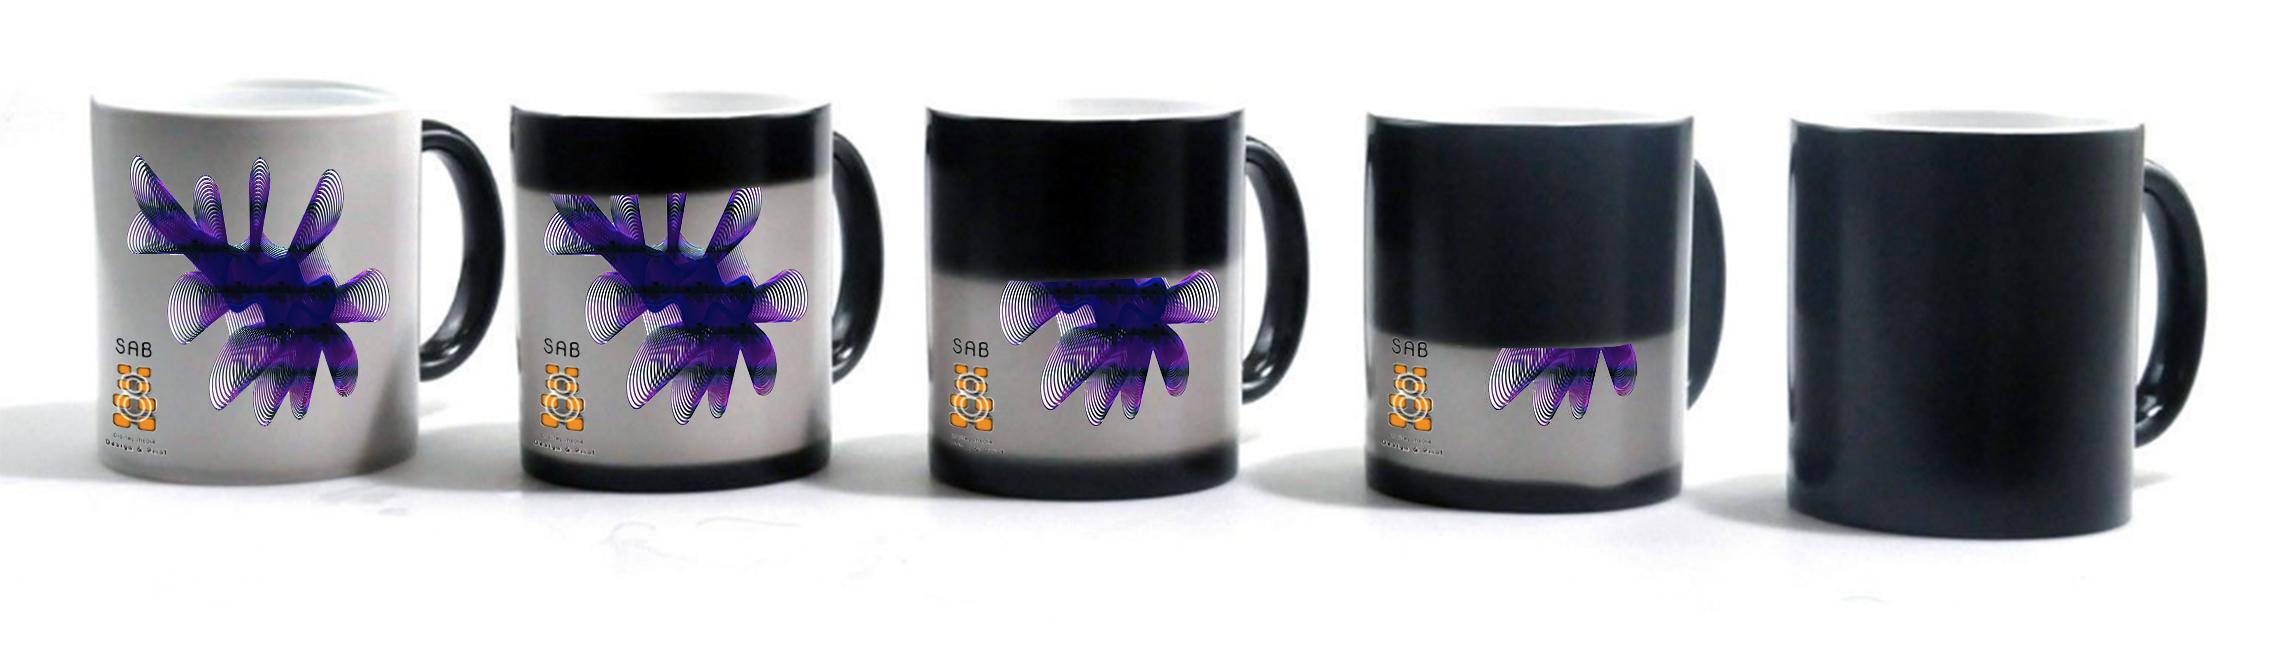 heat mug 3